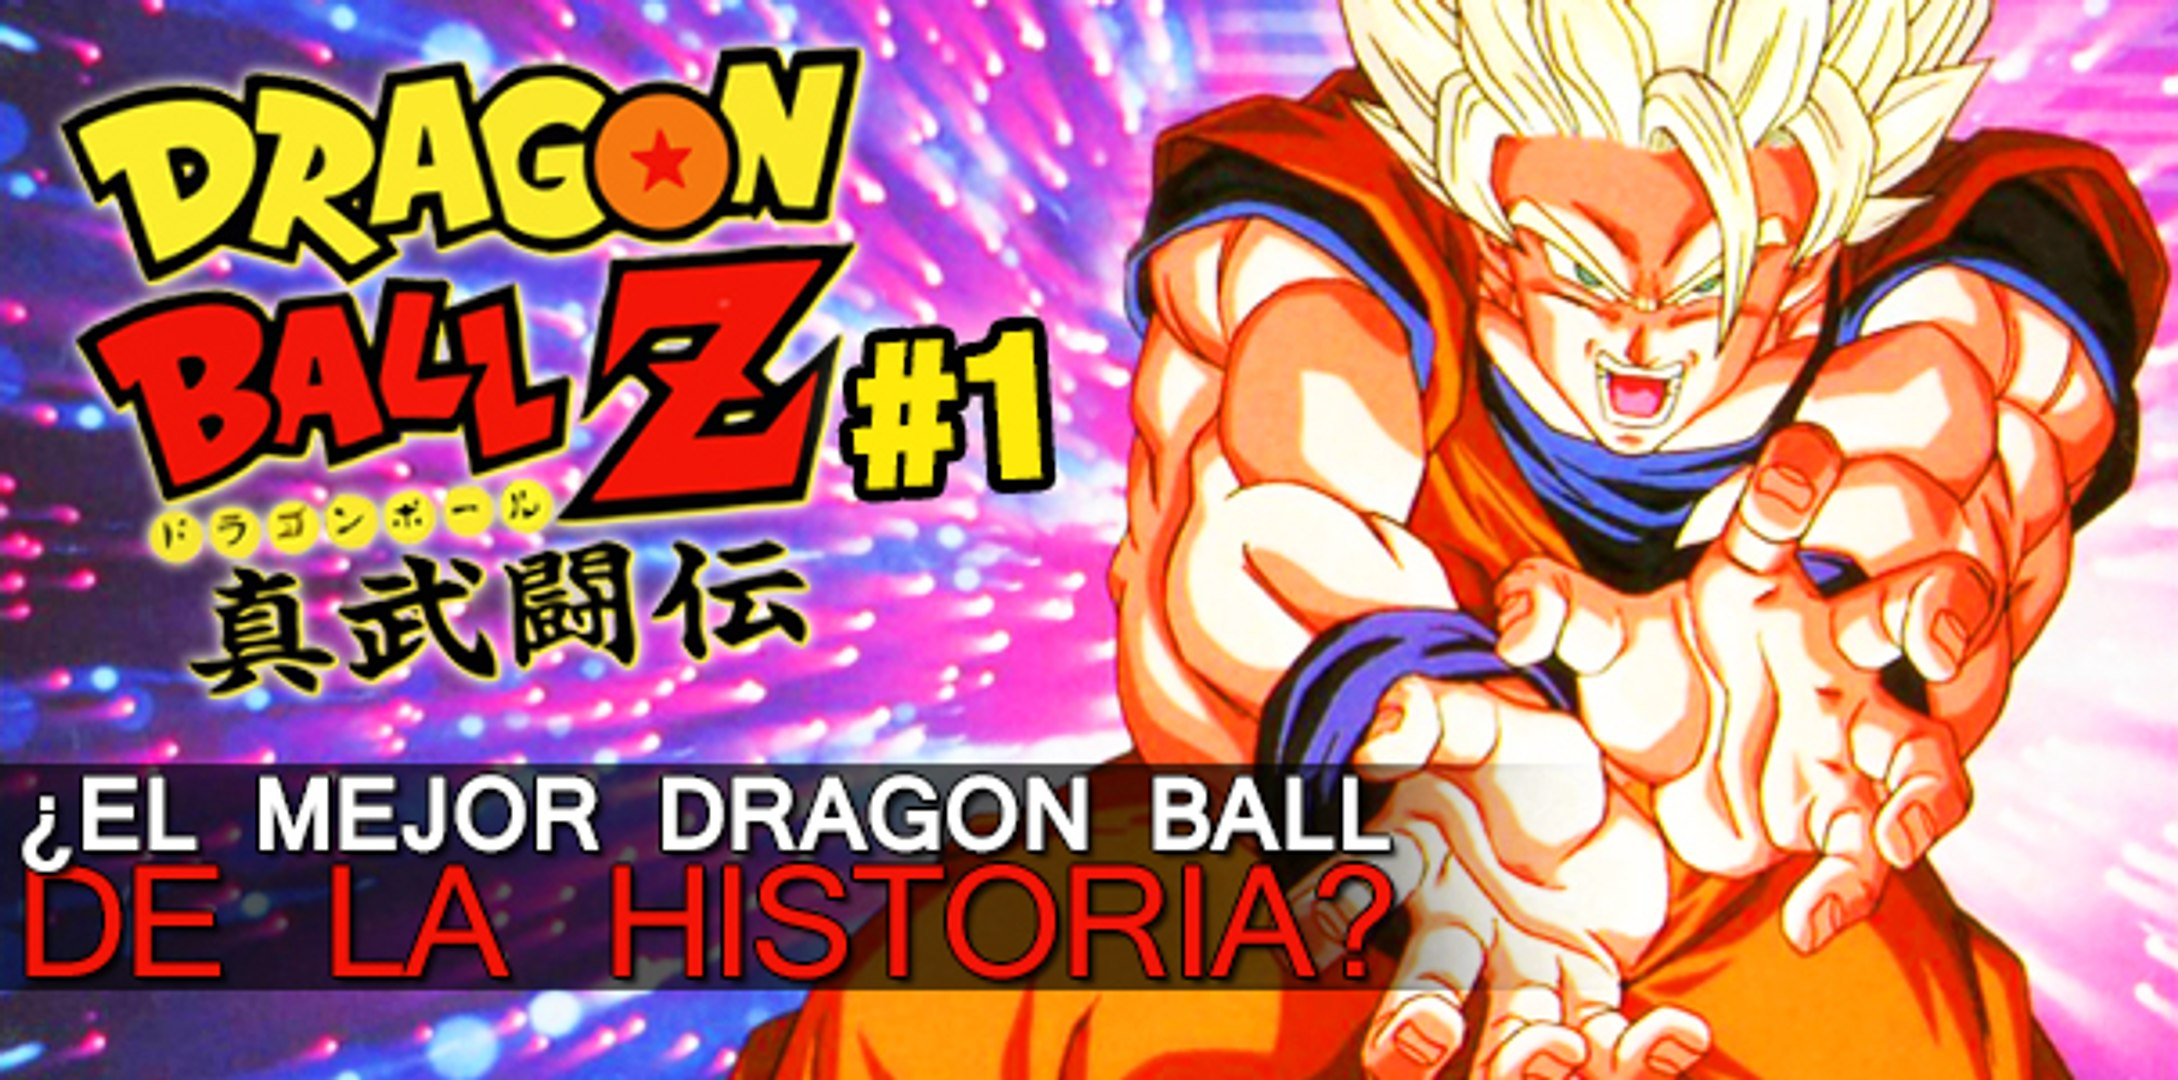 Dragon Ball Z #1 ¿El Mejor Dragon Ball de la Historia?